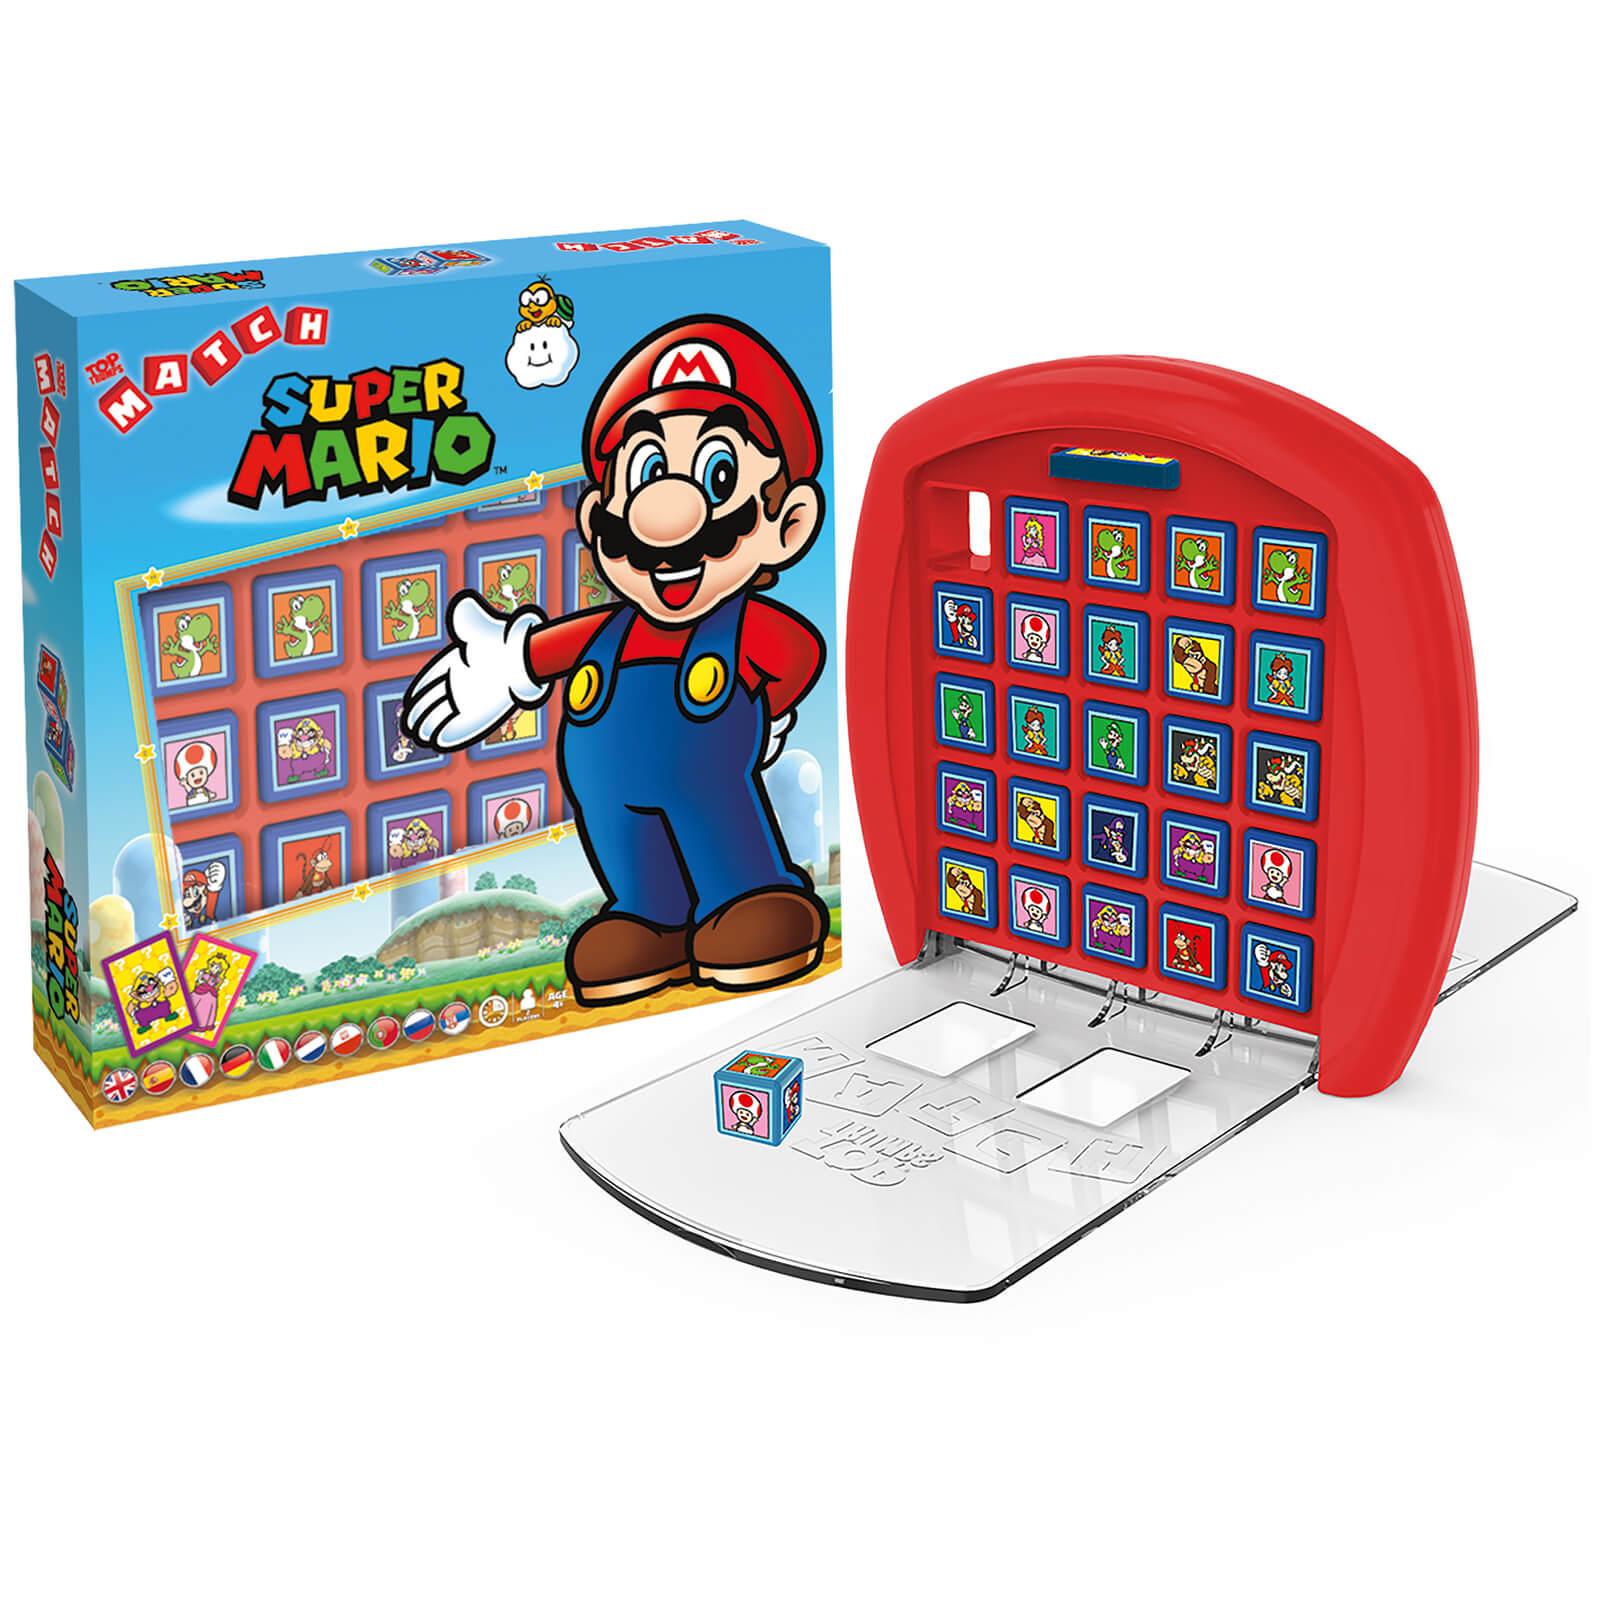 Image of Top Trumps Match - Super Mario